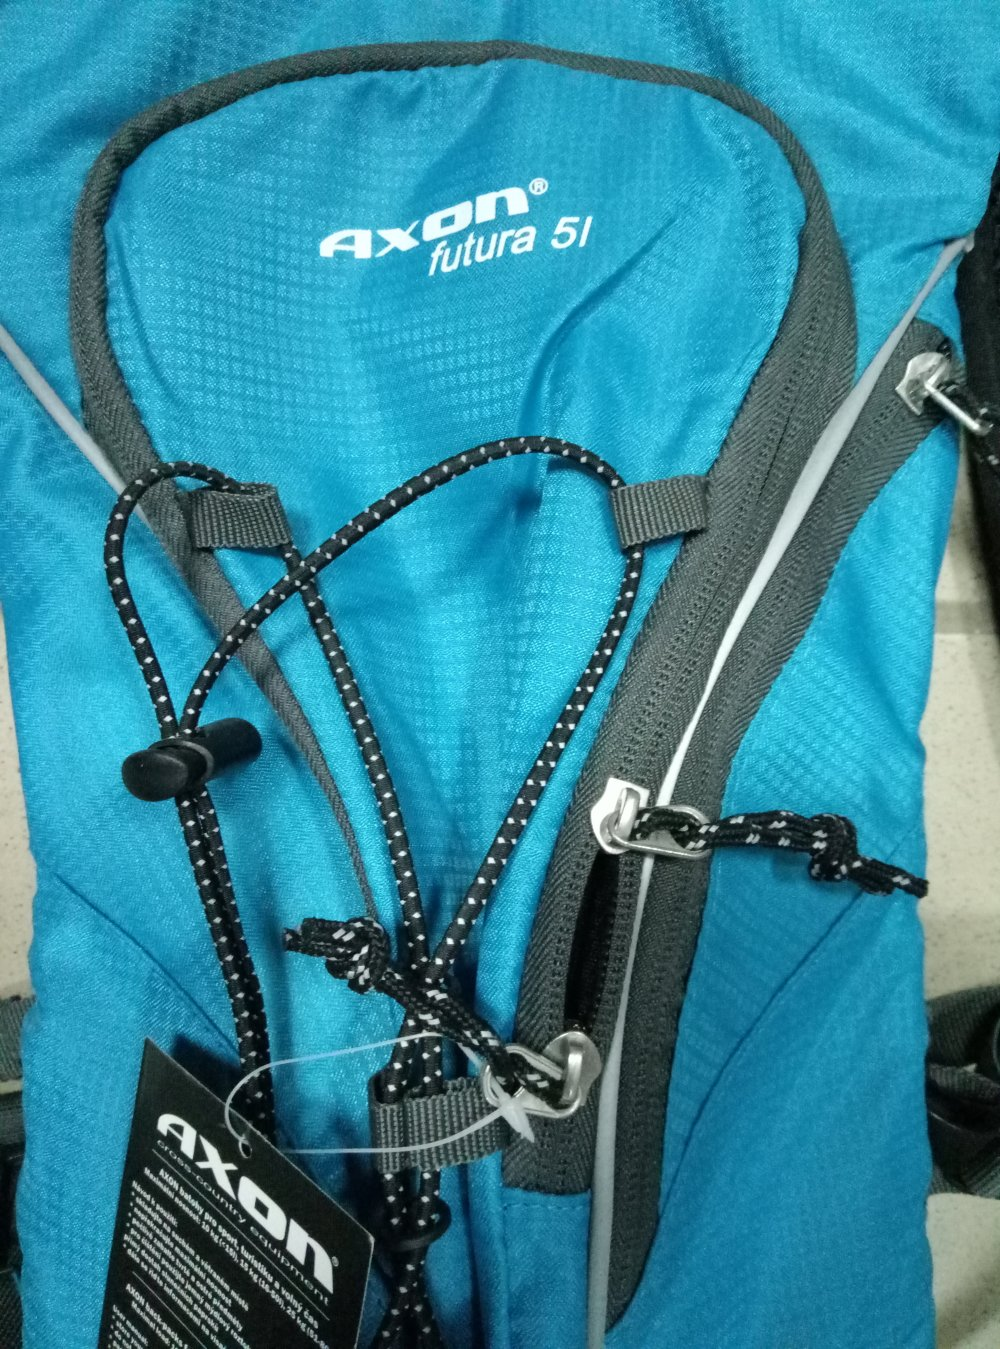 Рюкзак Axon Futura 5L